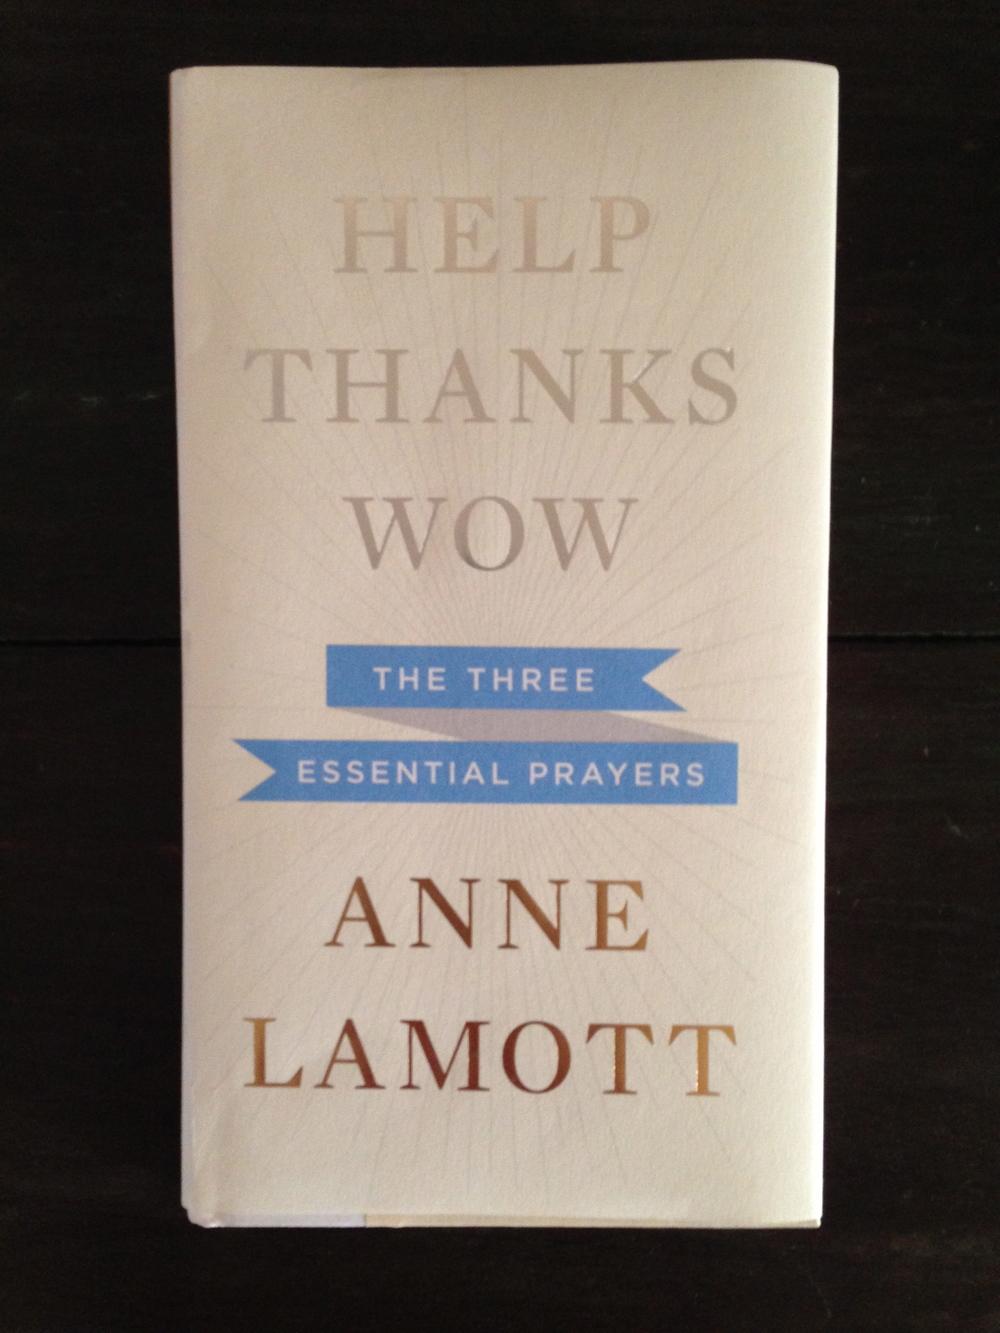 Anne Lamott's Help Thanks Wow